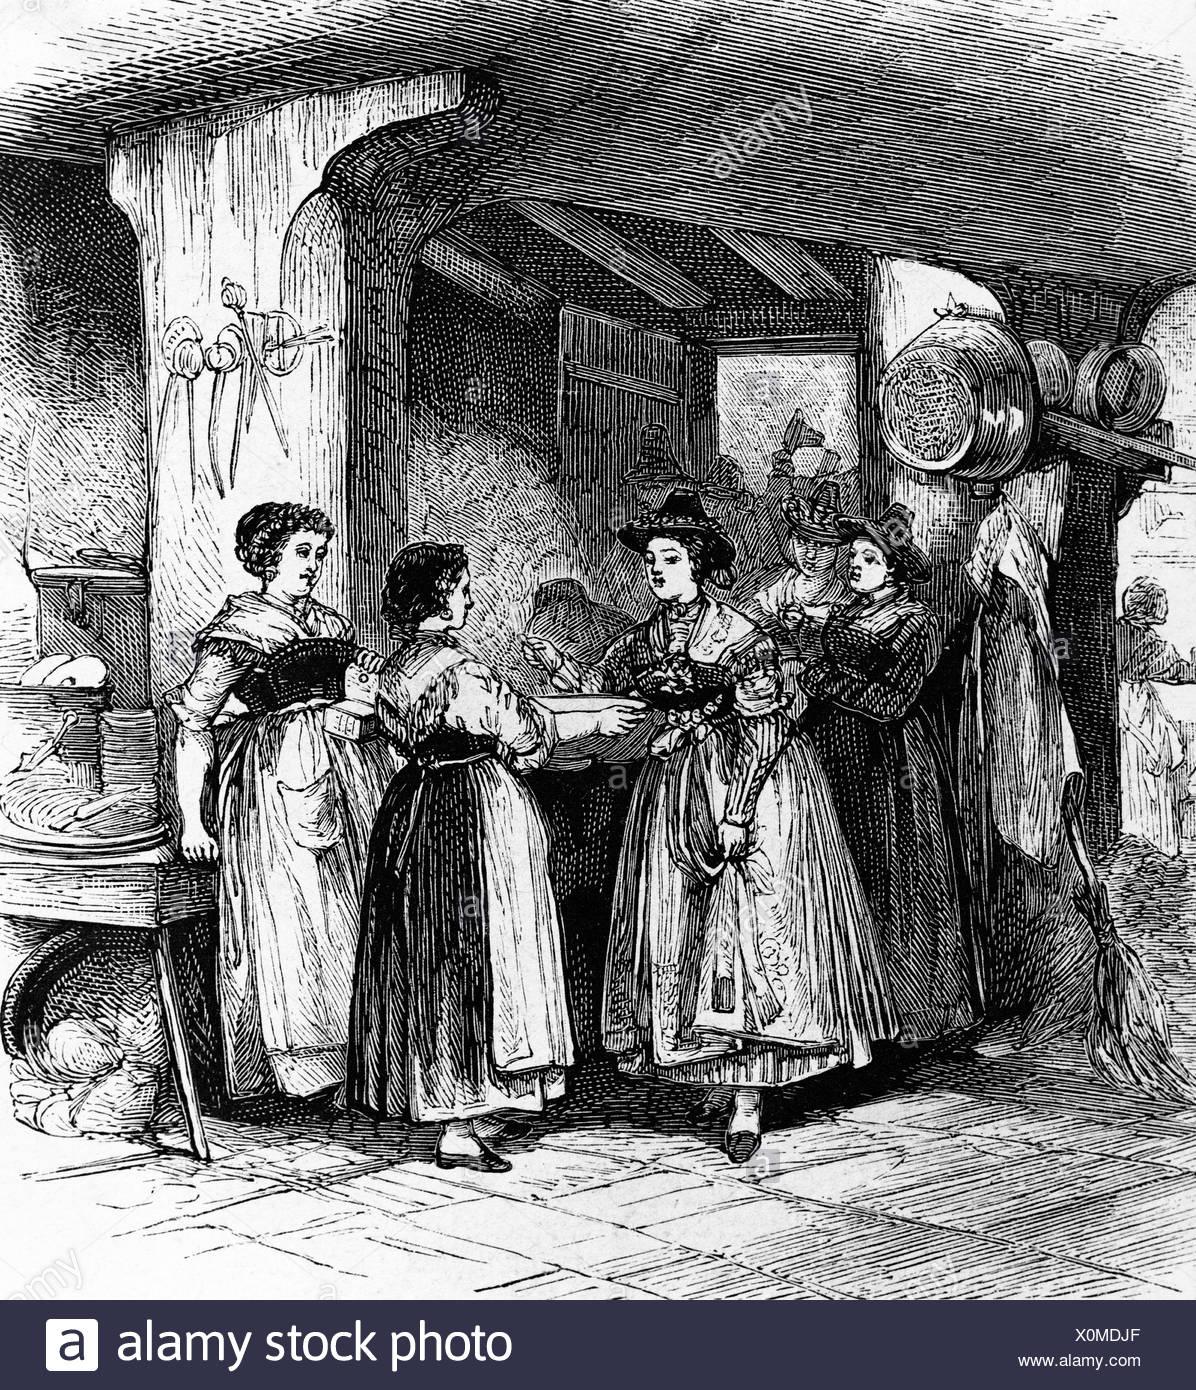 Salting of a soup, farmer's wedding in Lenggries, engraving, c. 1830, Upper Bavaria, Bavaria - Stock Image